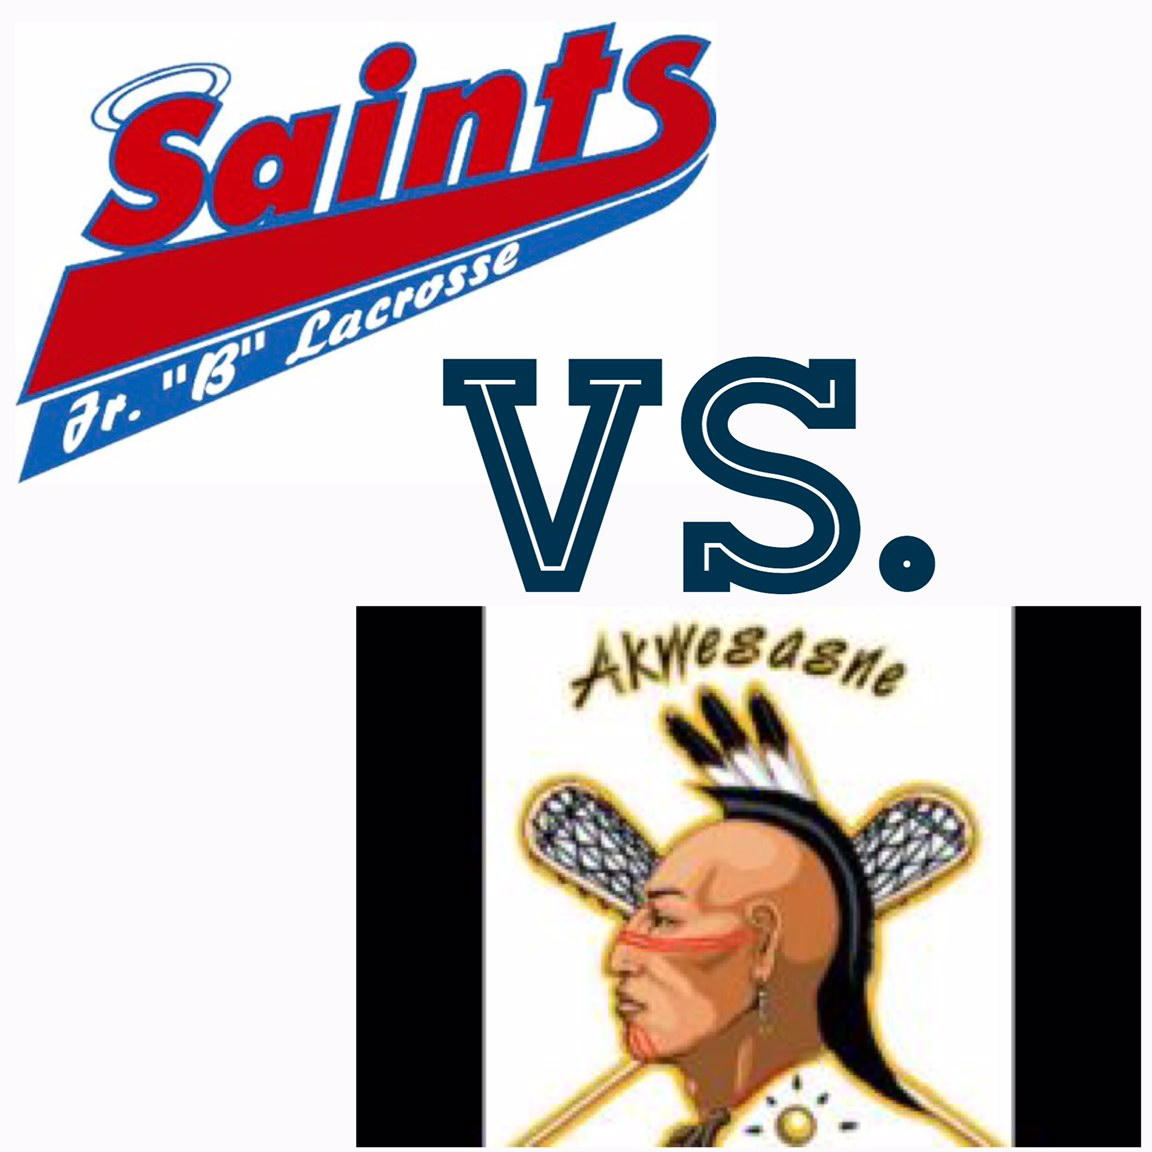 Saints Vs Akwesasne Logos.jpeg